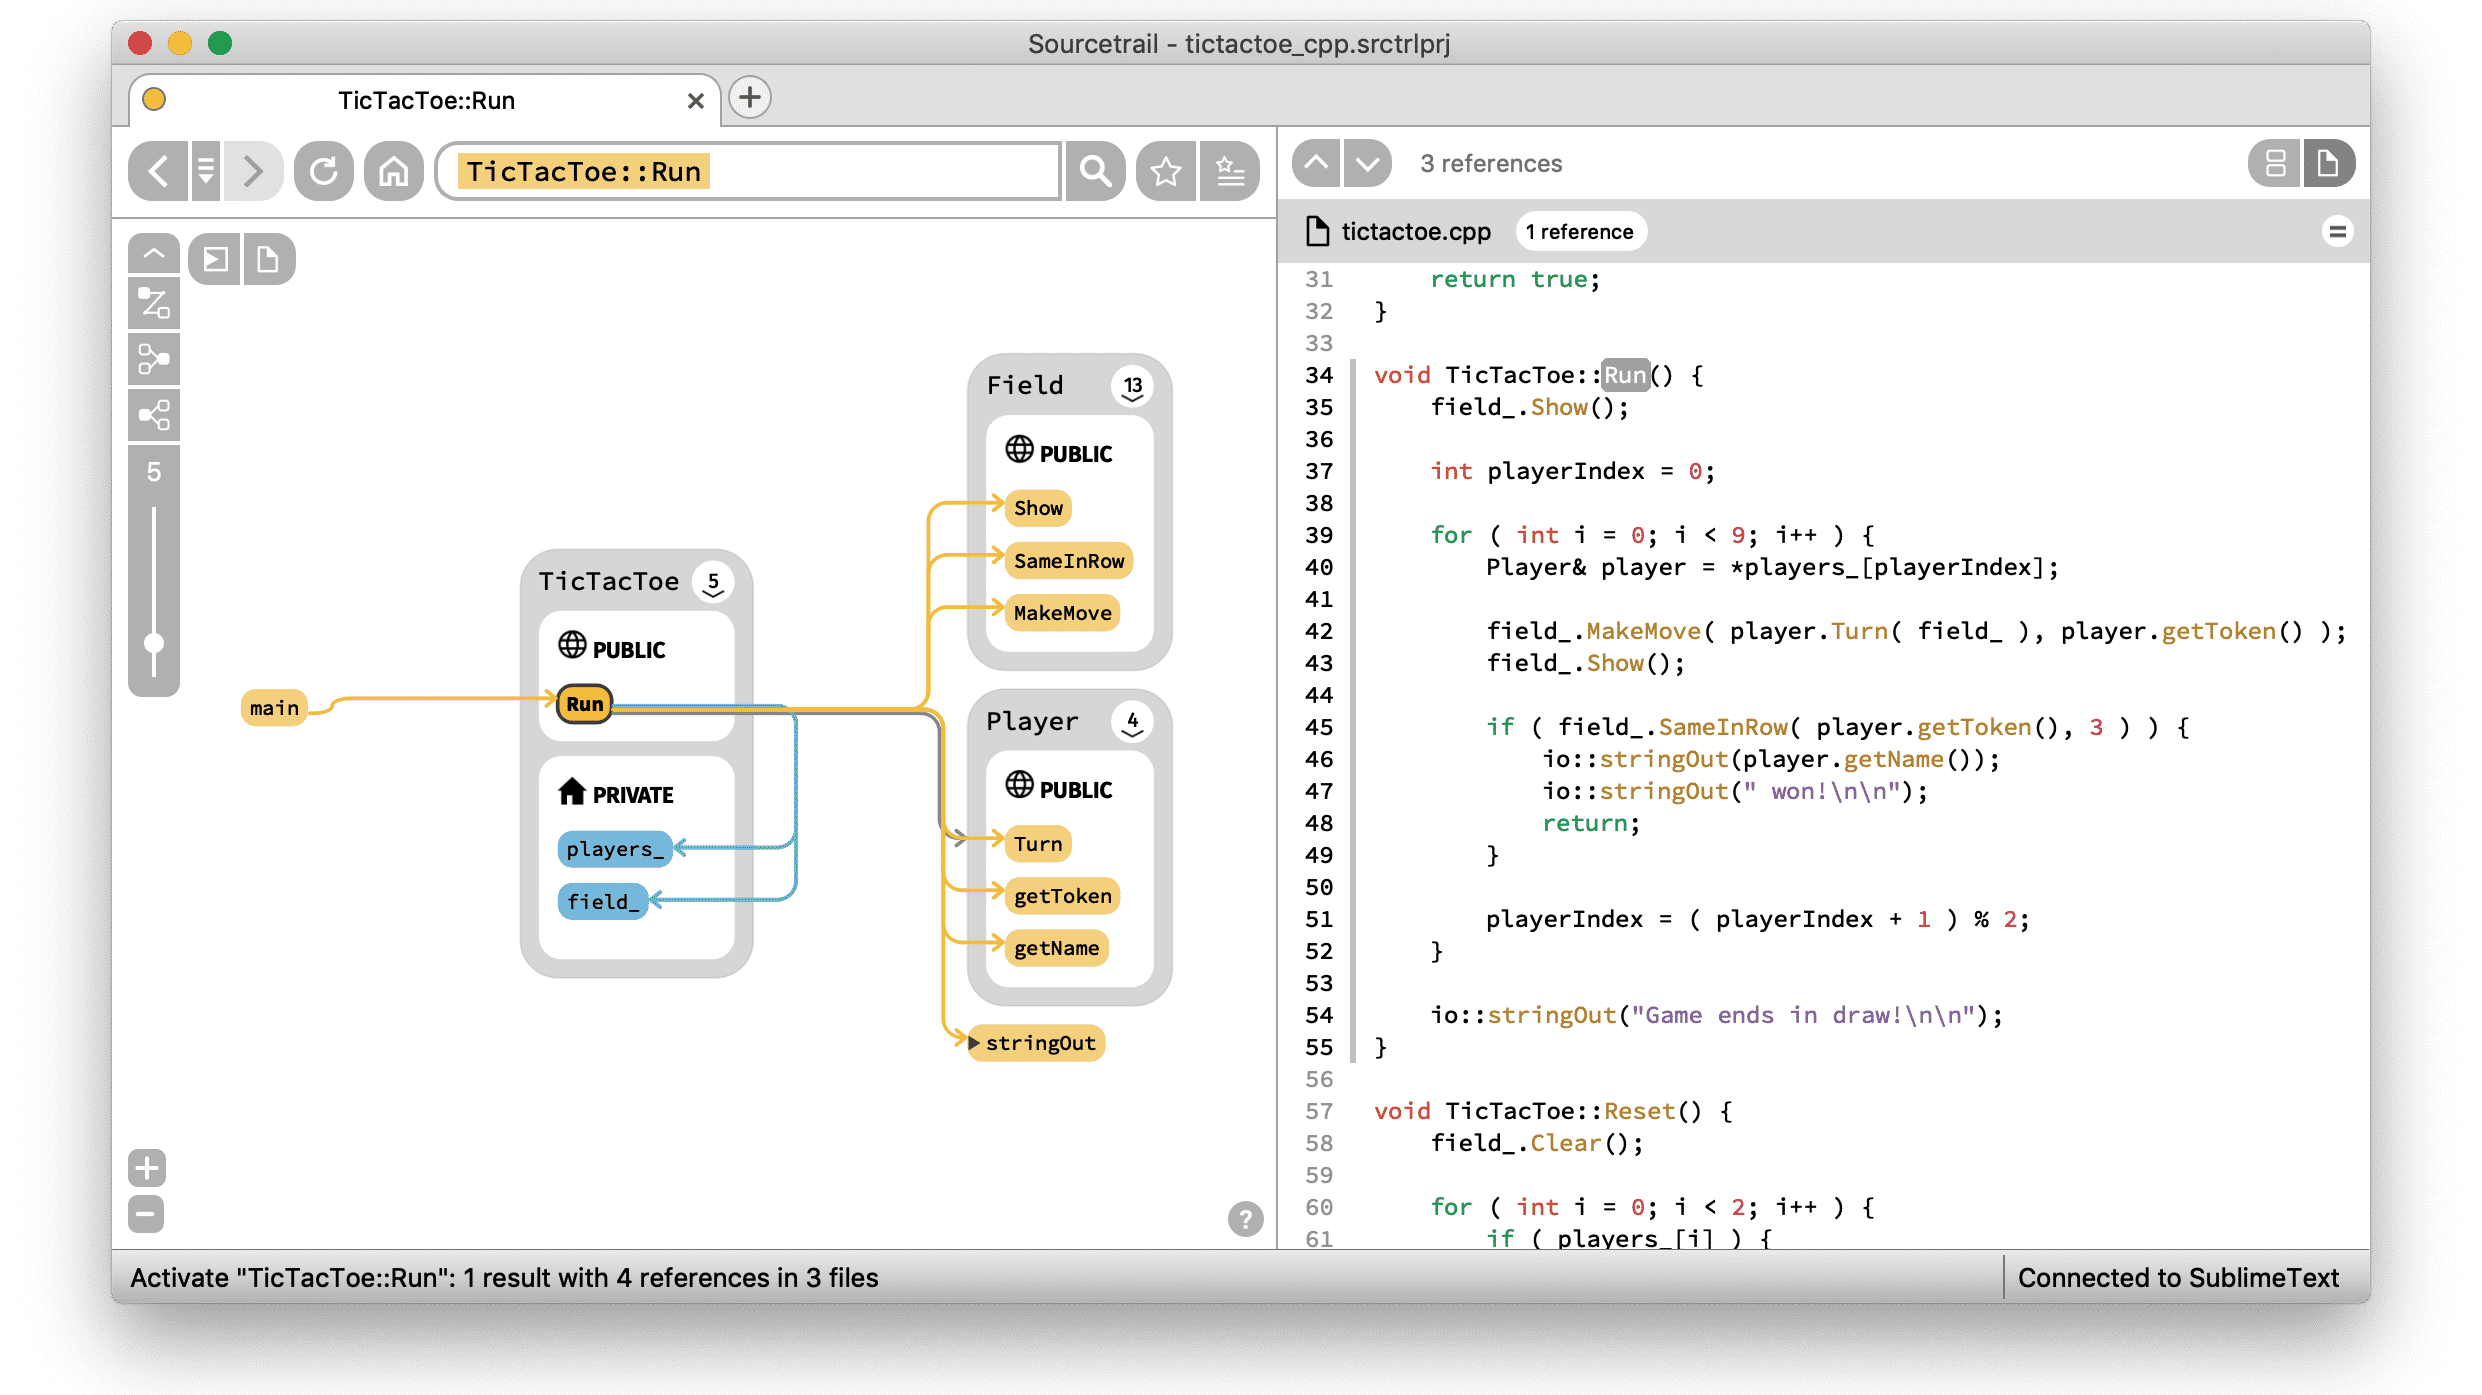 Sourcetrail wird Open Source